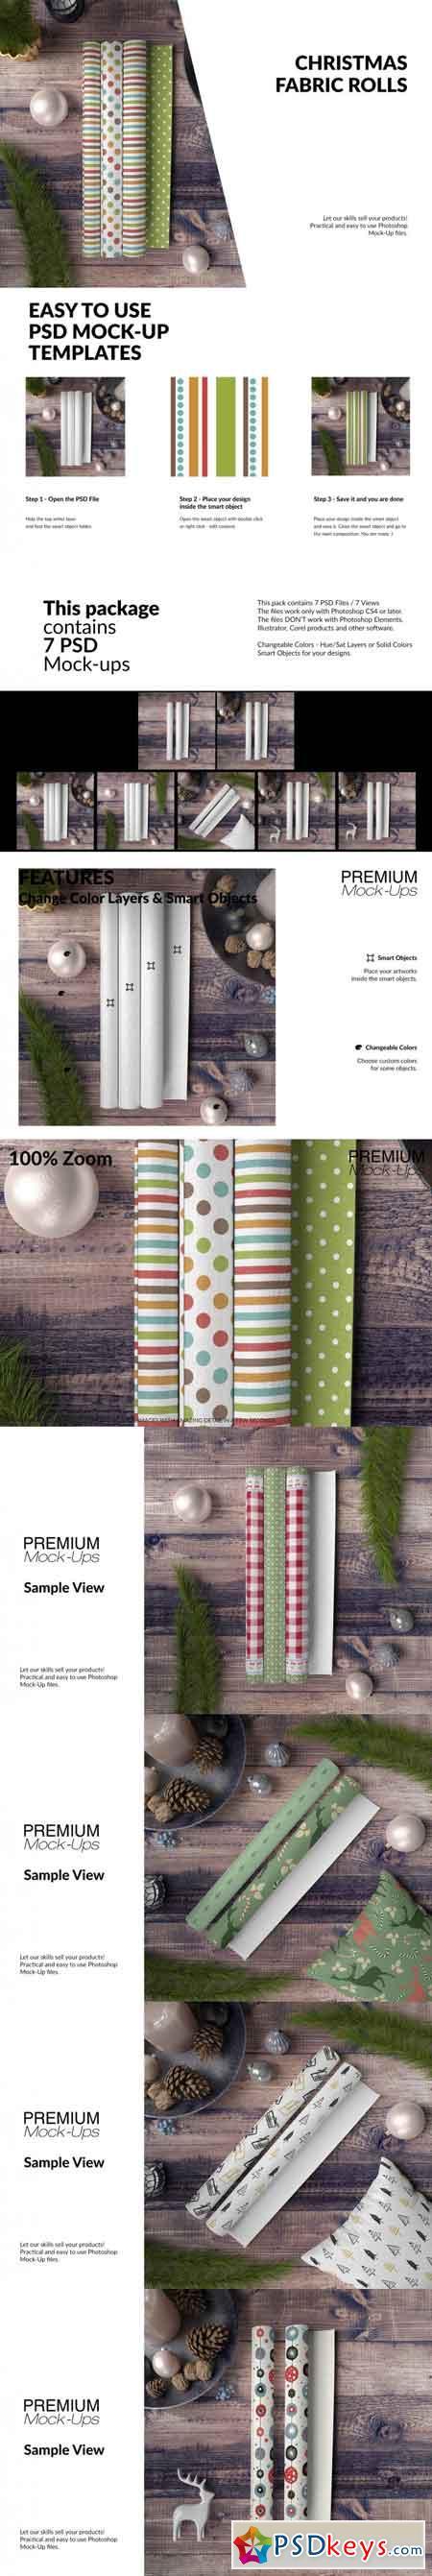 Christmas Fabric Rolls Set 3510865